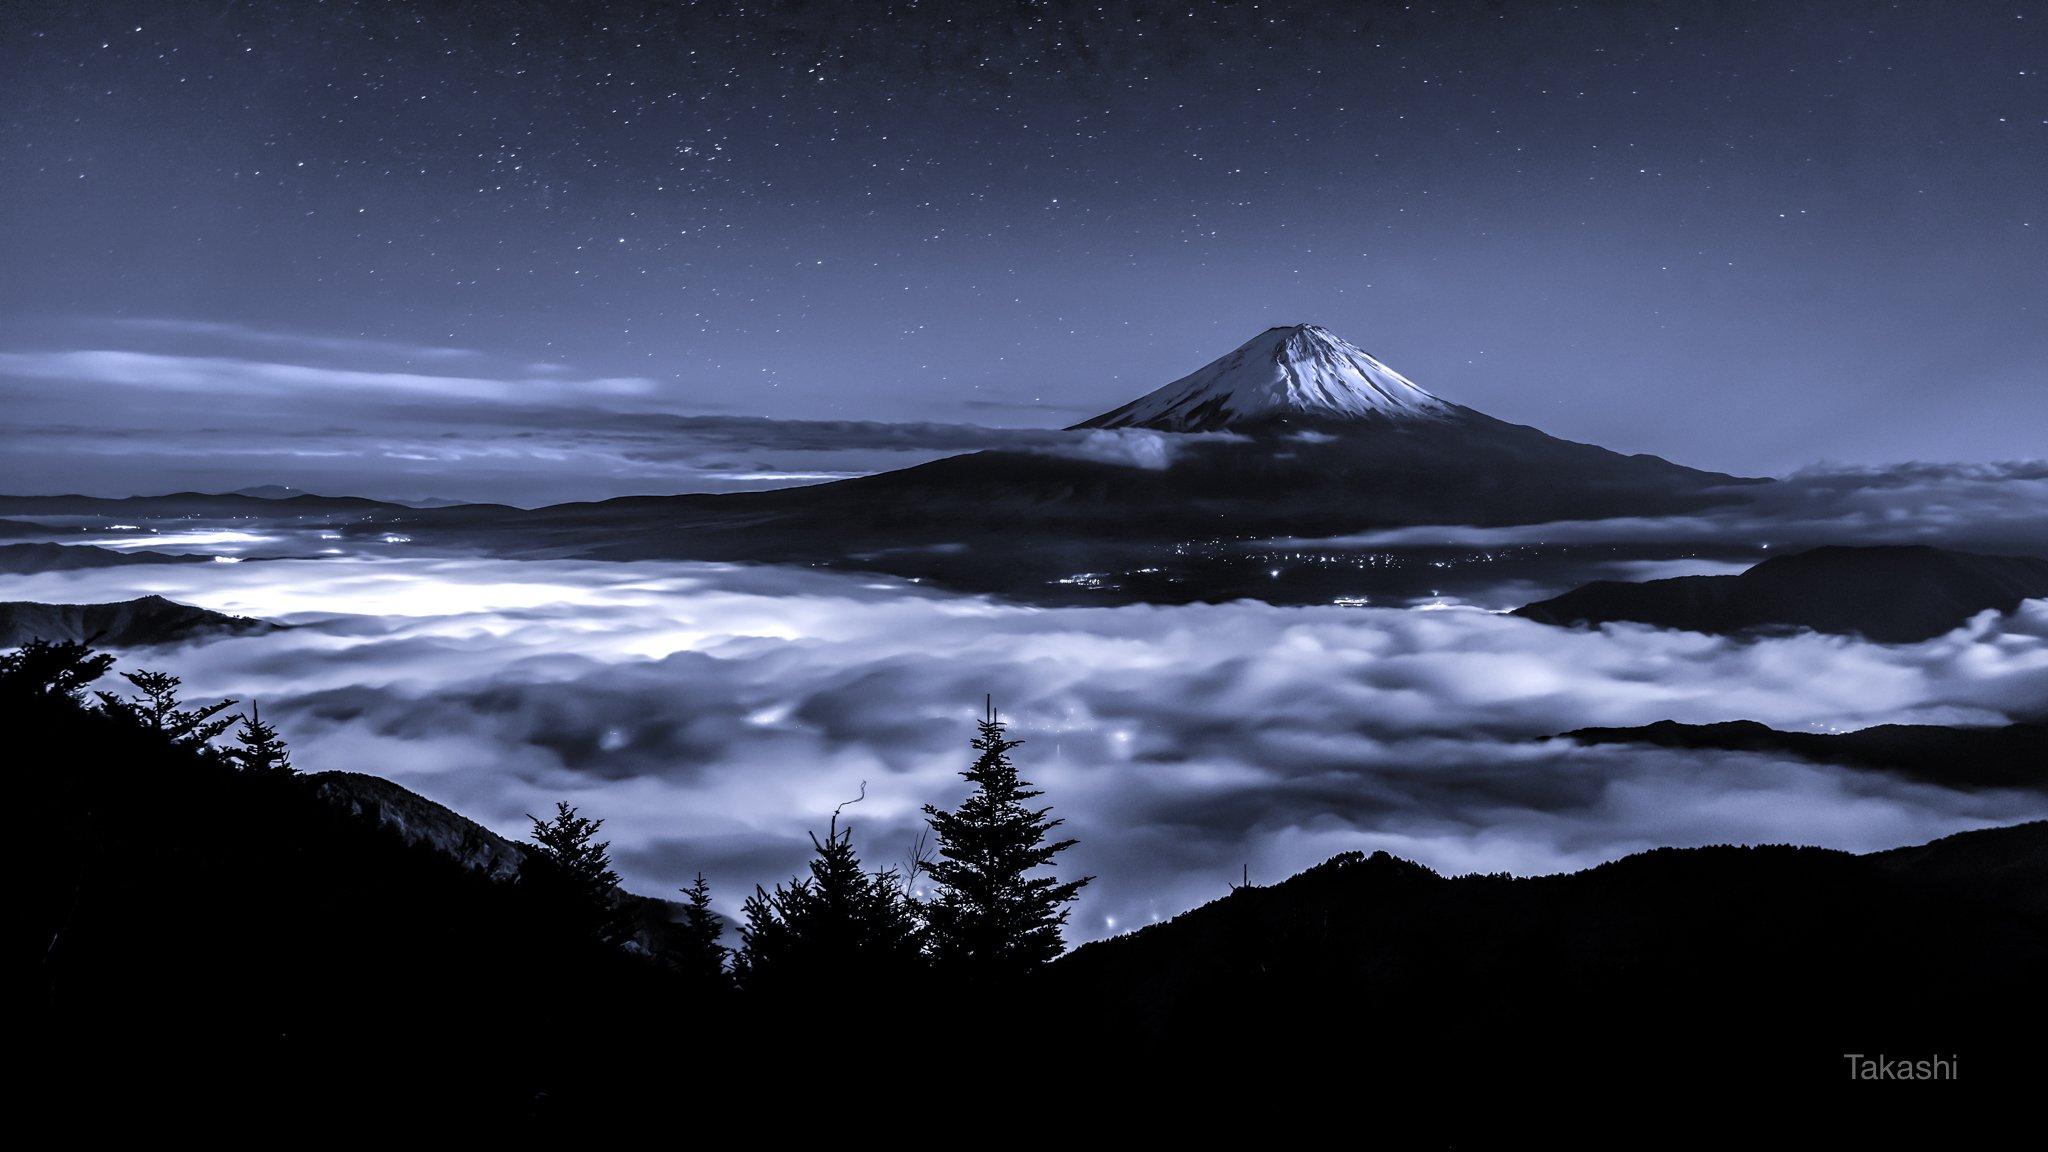 Fuji,Japan,mountain,clouds,sky,stars,sea of clouds,tree,night,moonlit,amazing,beautiful,snow, Takashi